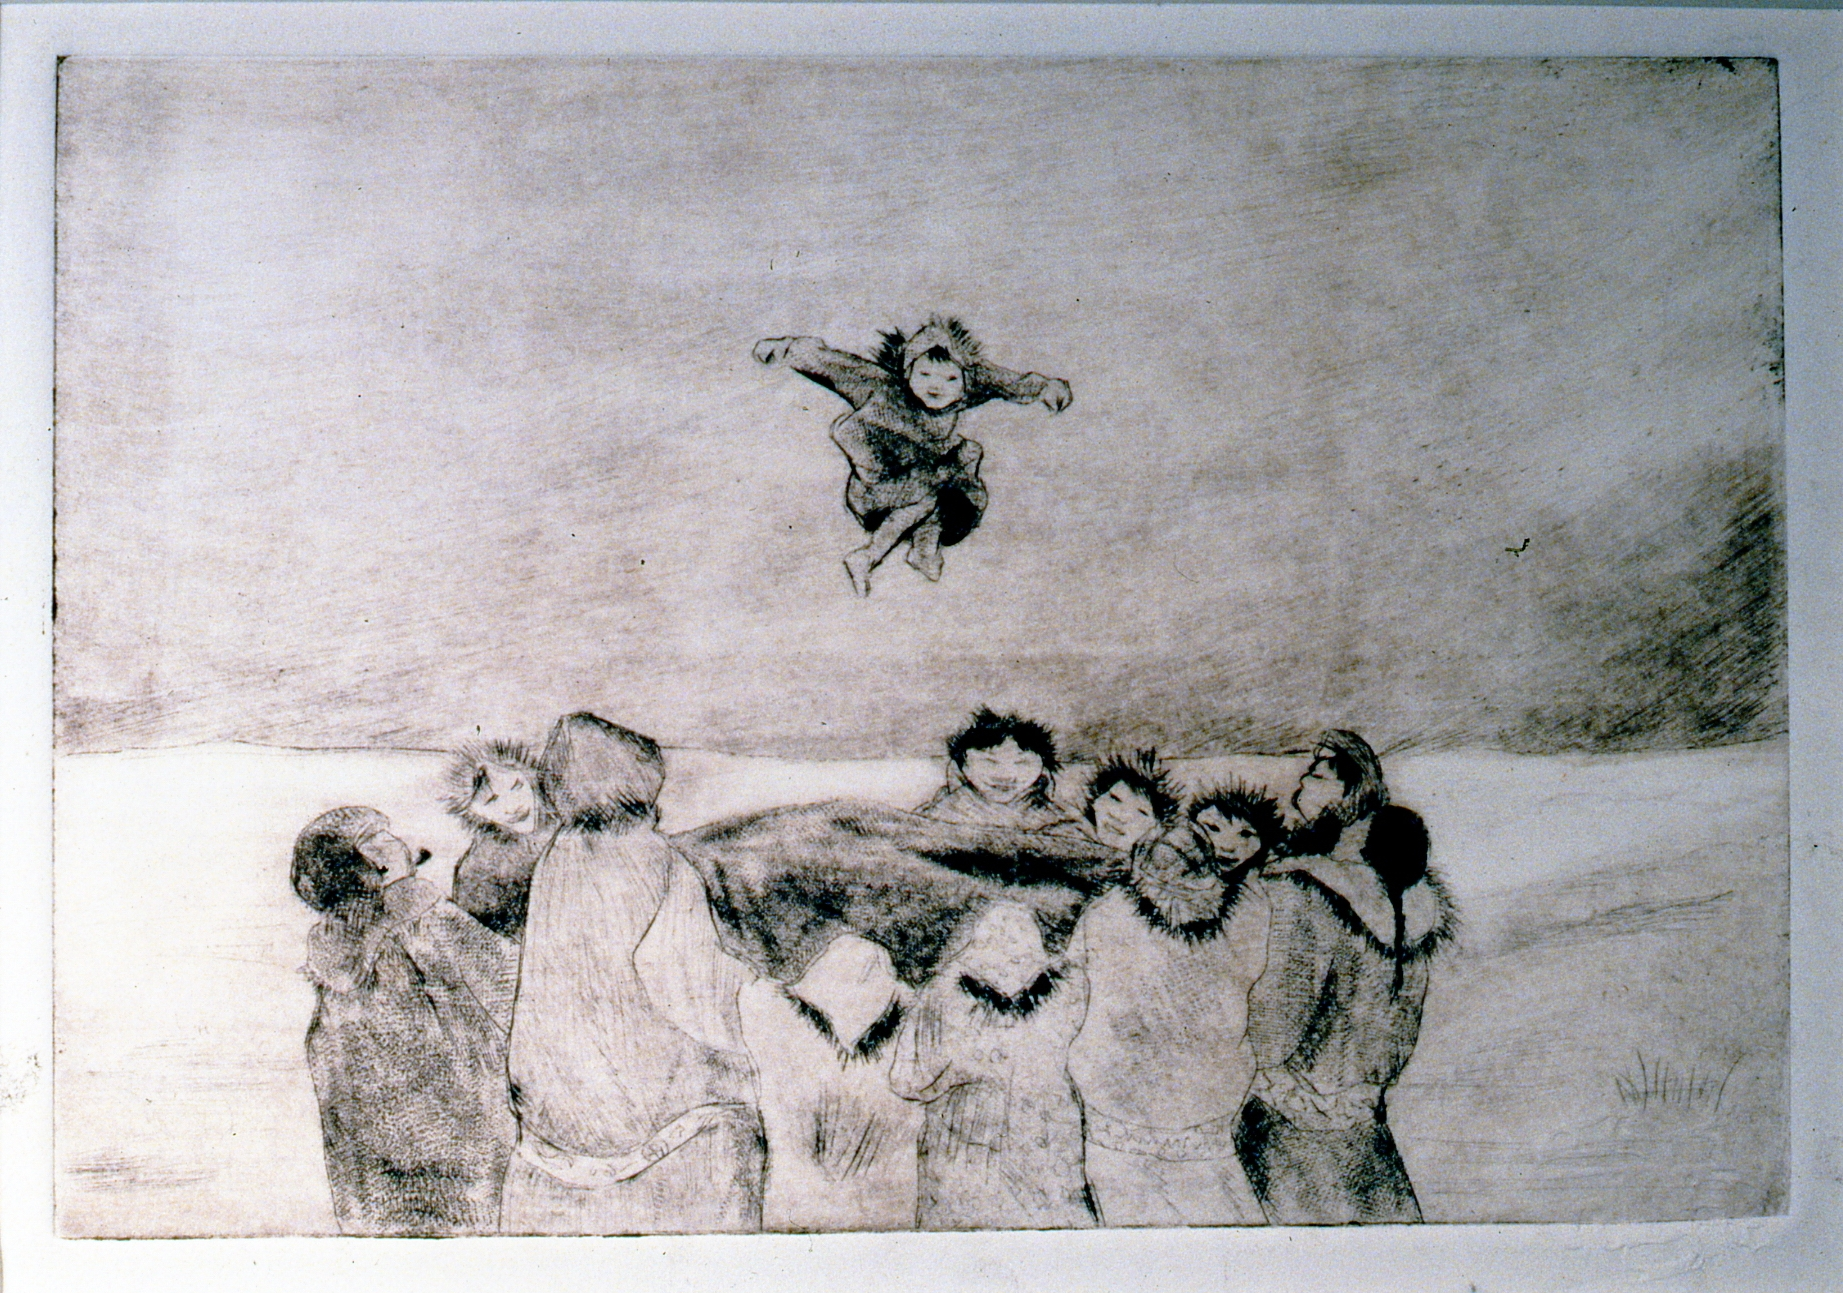 Blanket Toss , 1986, Minn Sjølseth, artist proof, 15 x 22.5 cm, 1996.02.19